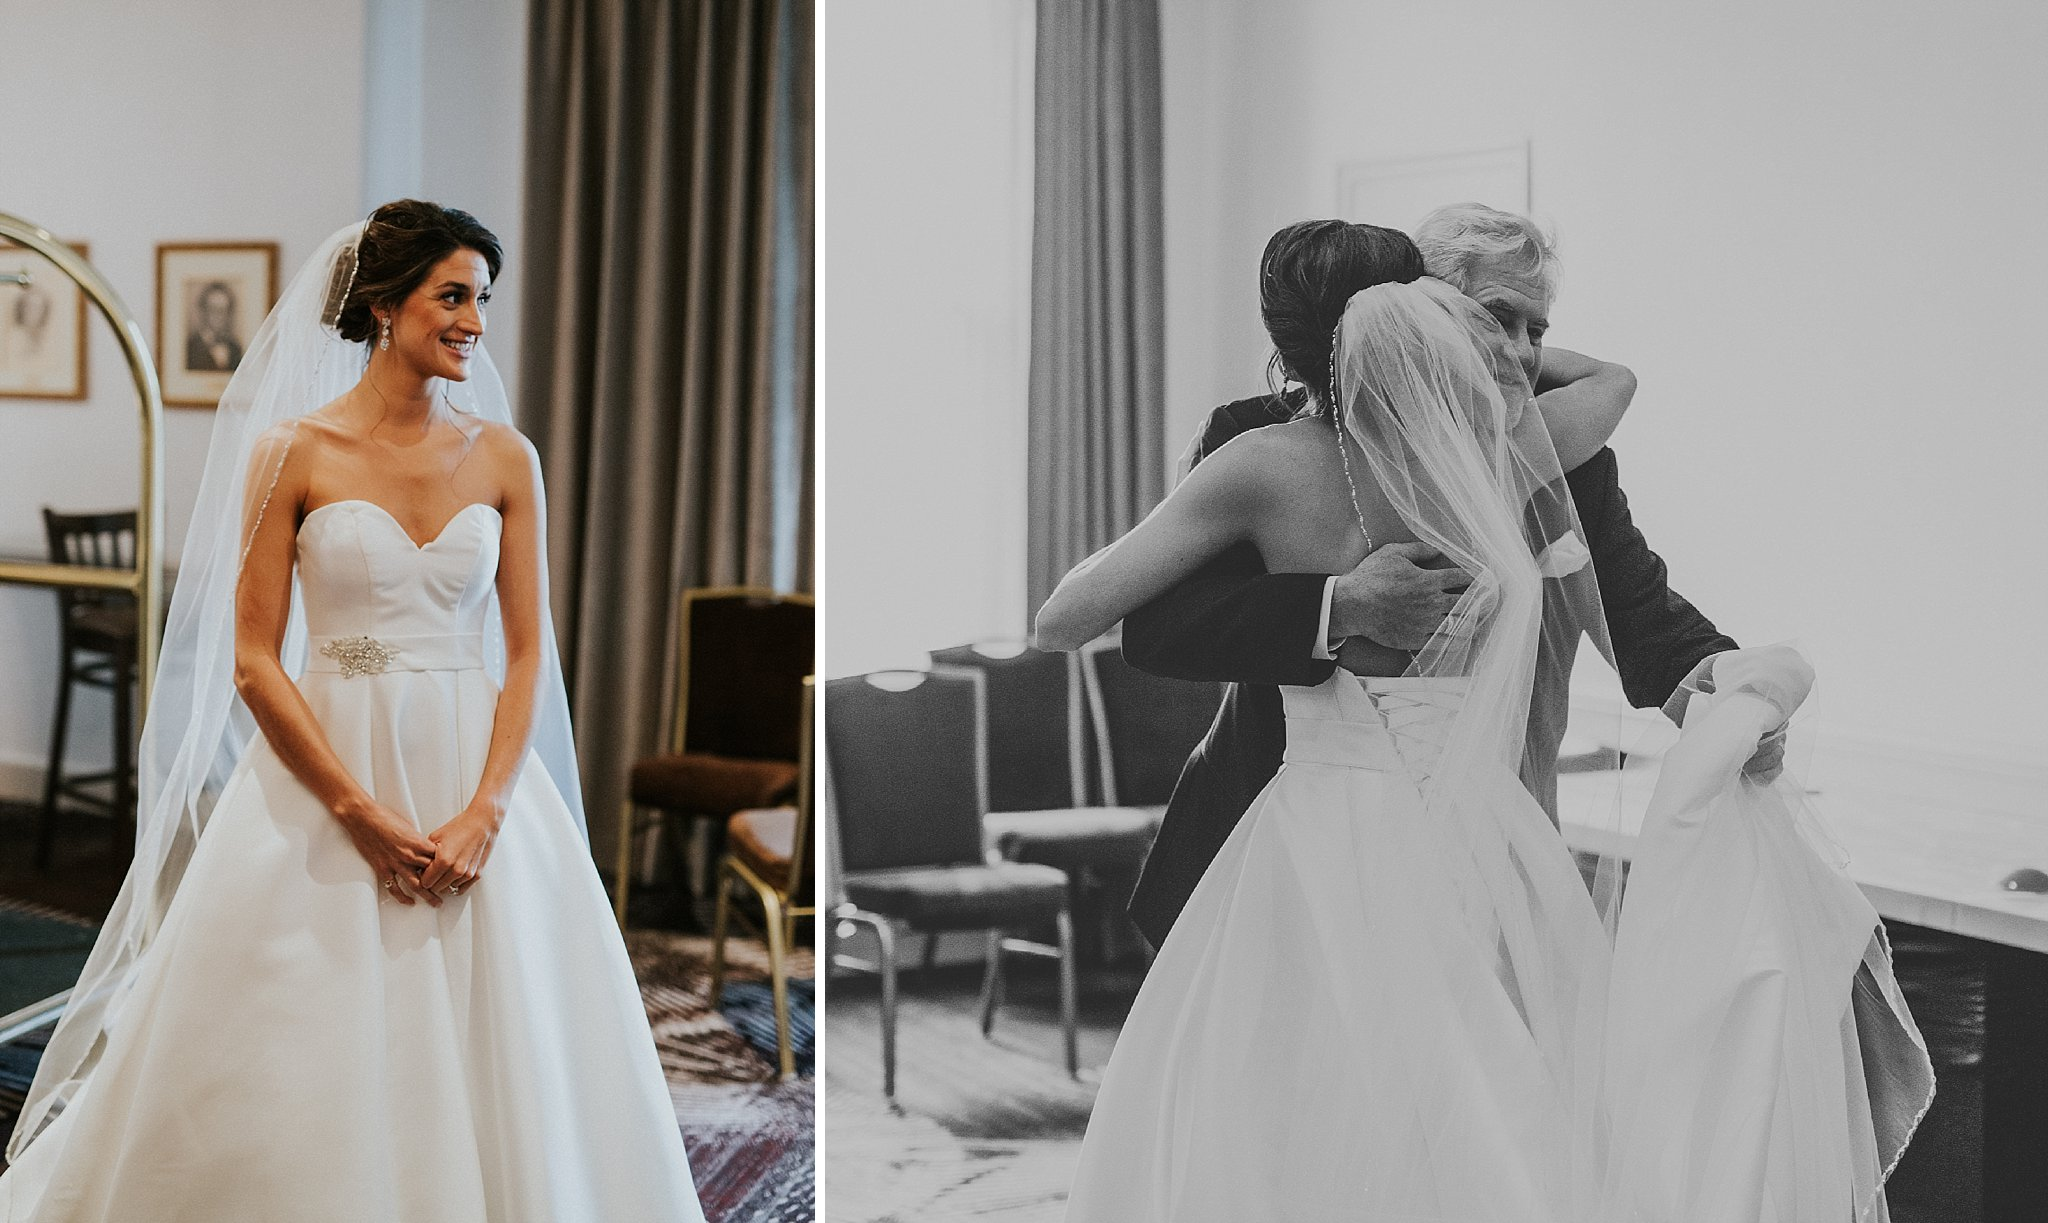 Matt-Lauren_St-Marys_Hilton-City-Center-Milwaukee-Wedding_liller-photo_0012.jpg